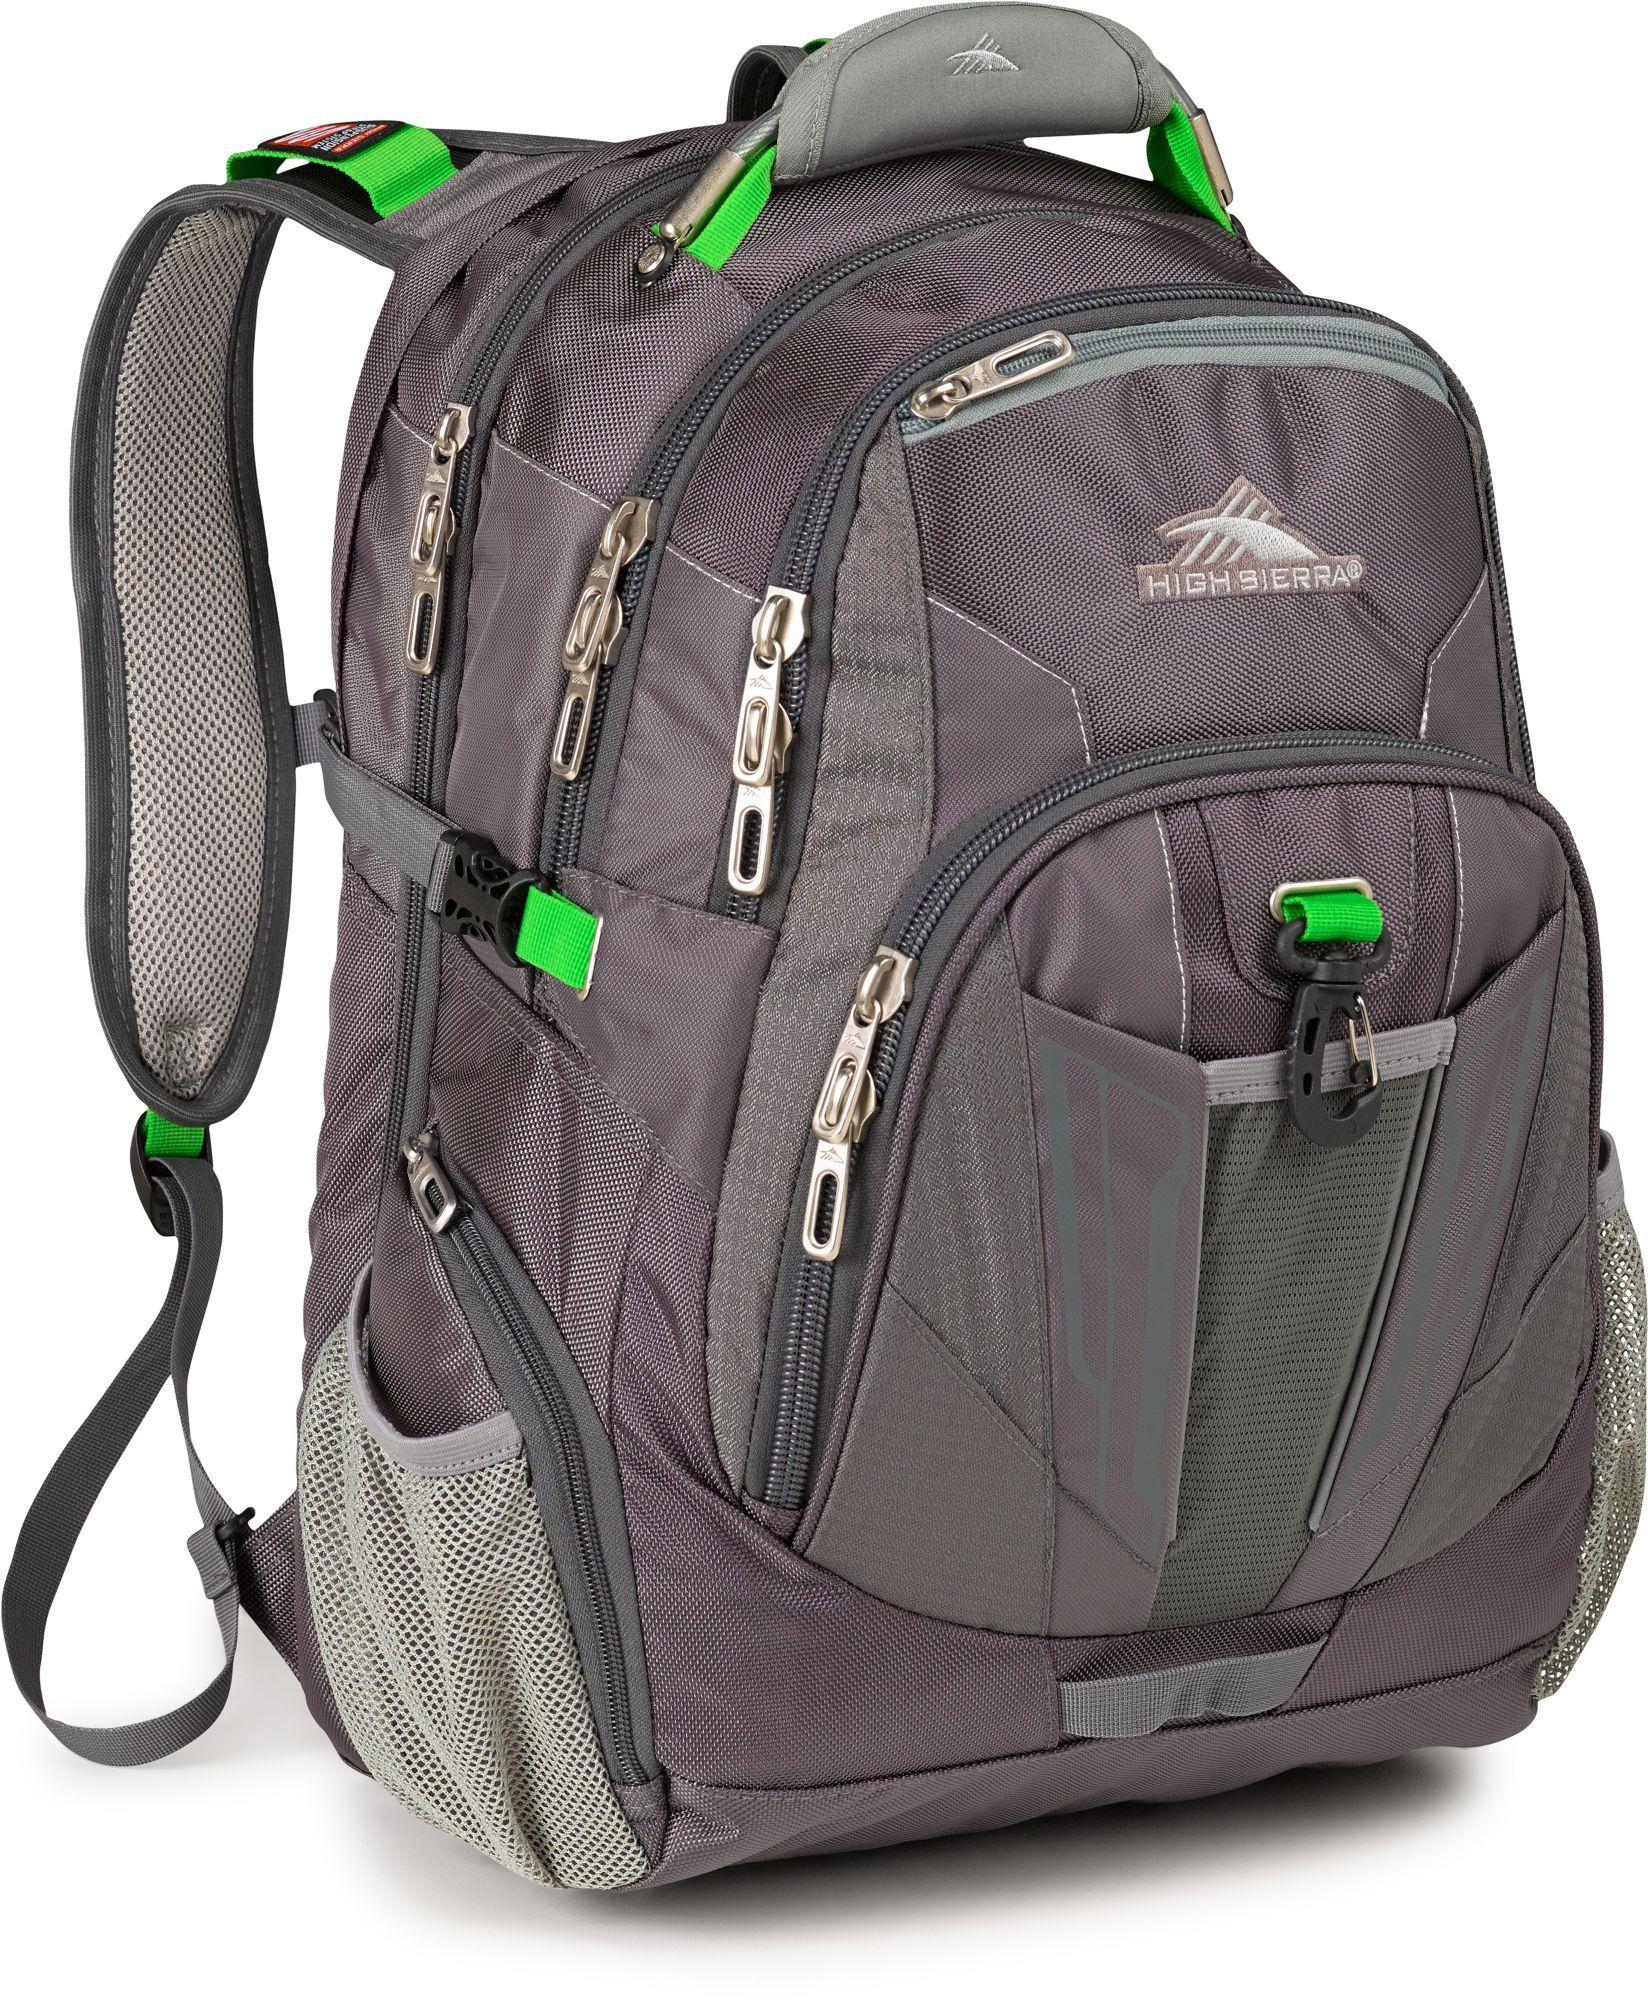 High Sierra XBT TSA Laptop Backpack 4 Colors Business /& Laptop Backpack NEW